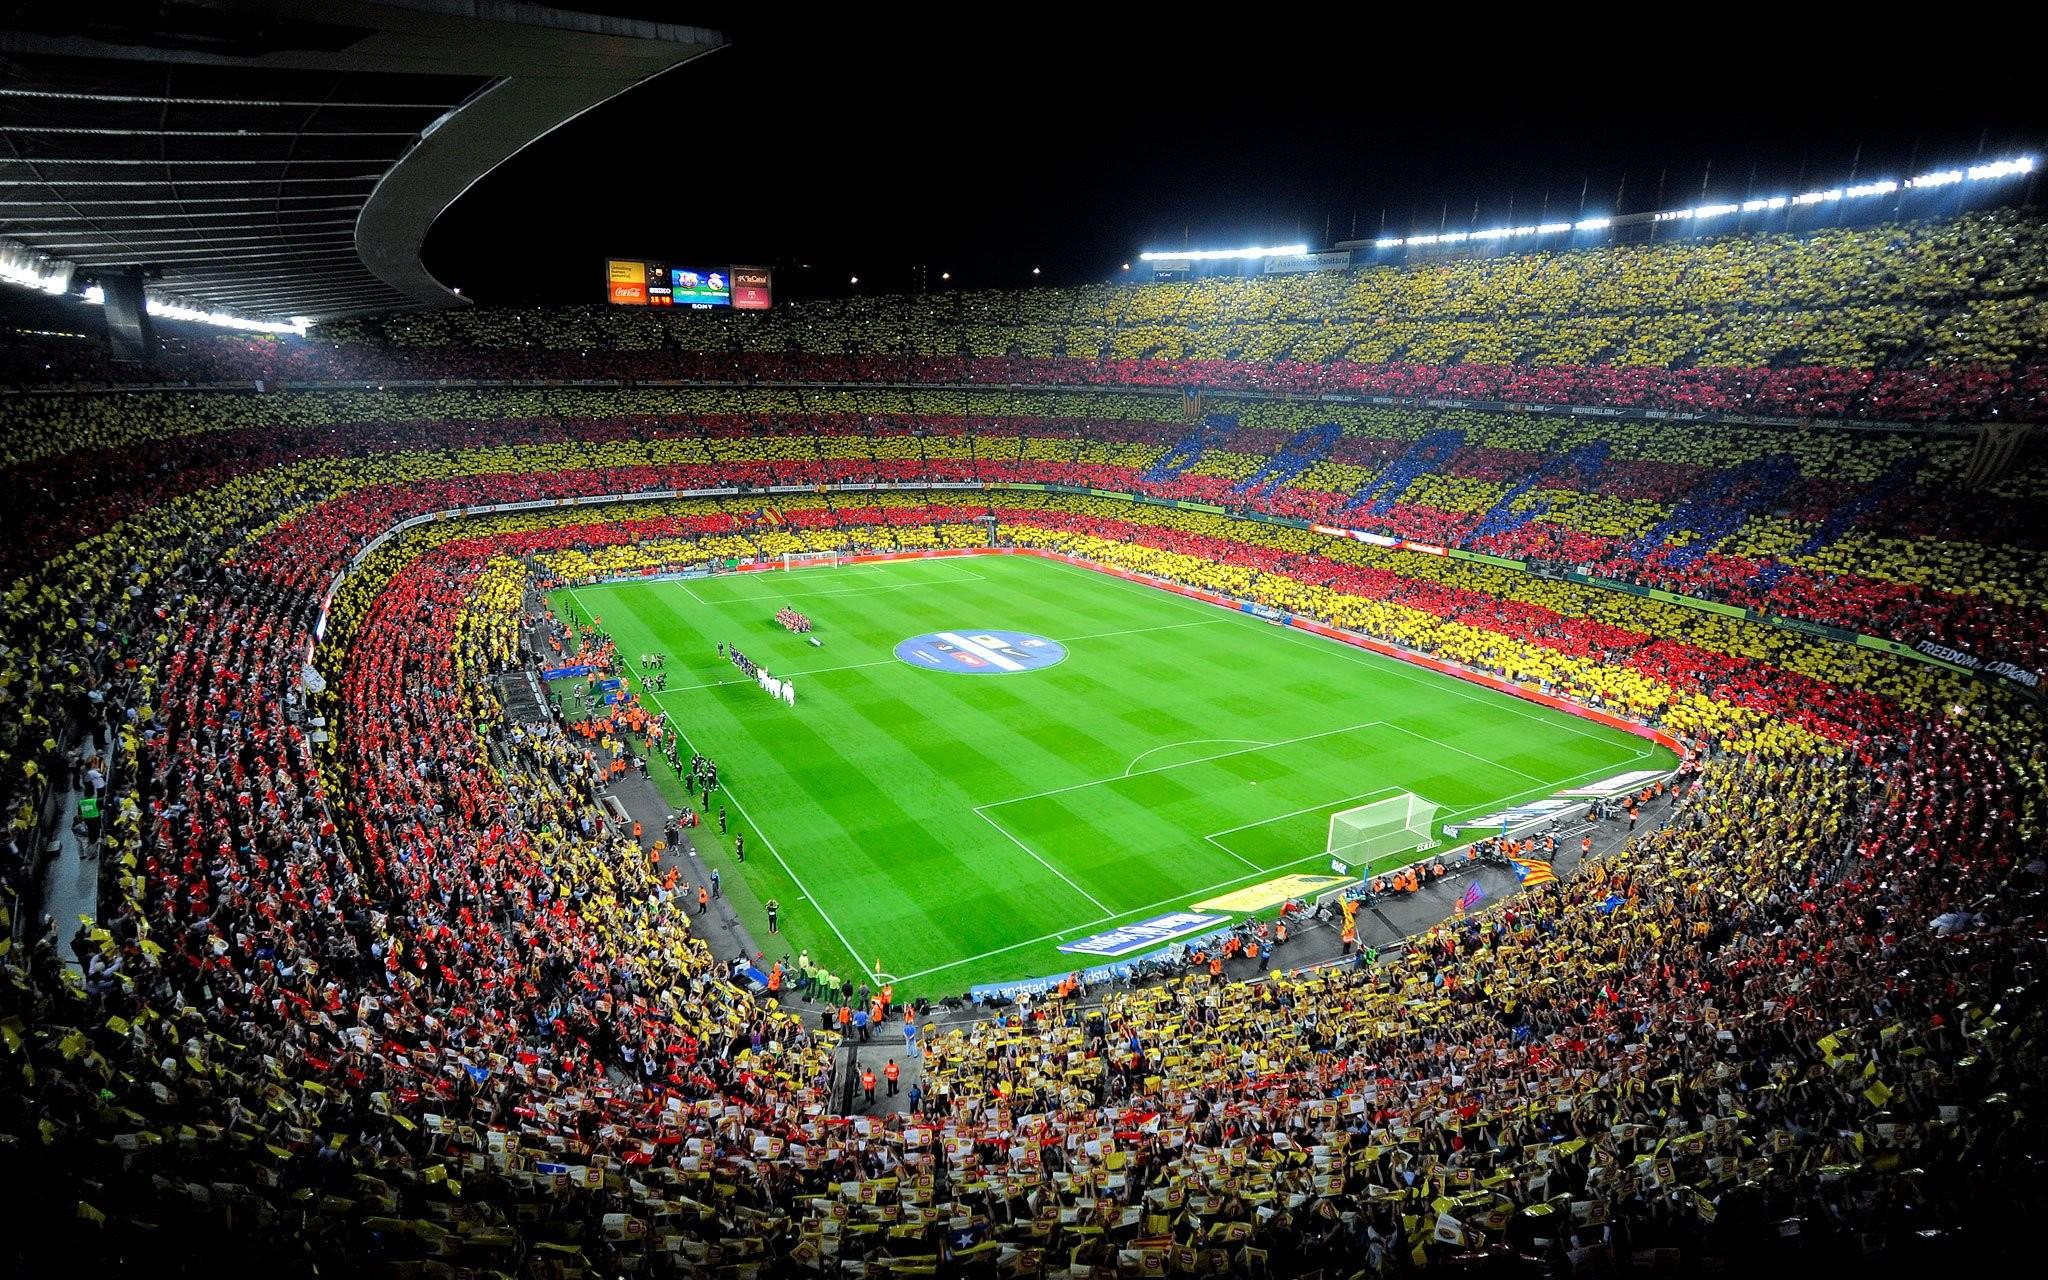 spain Camp Nou fc barcelona soccer stadium crowd wallpaper